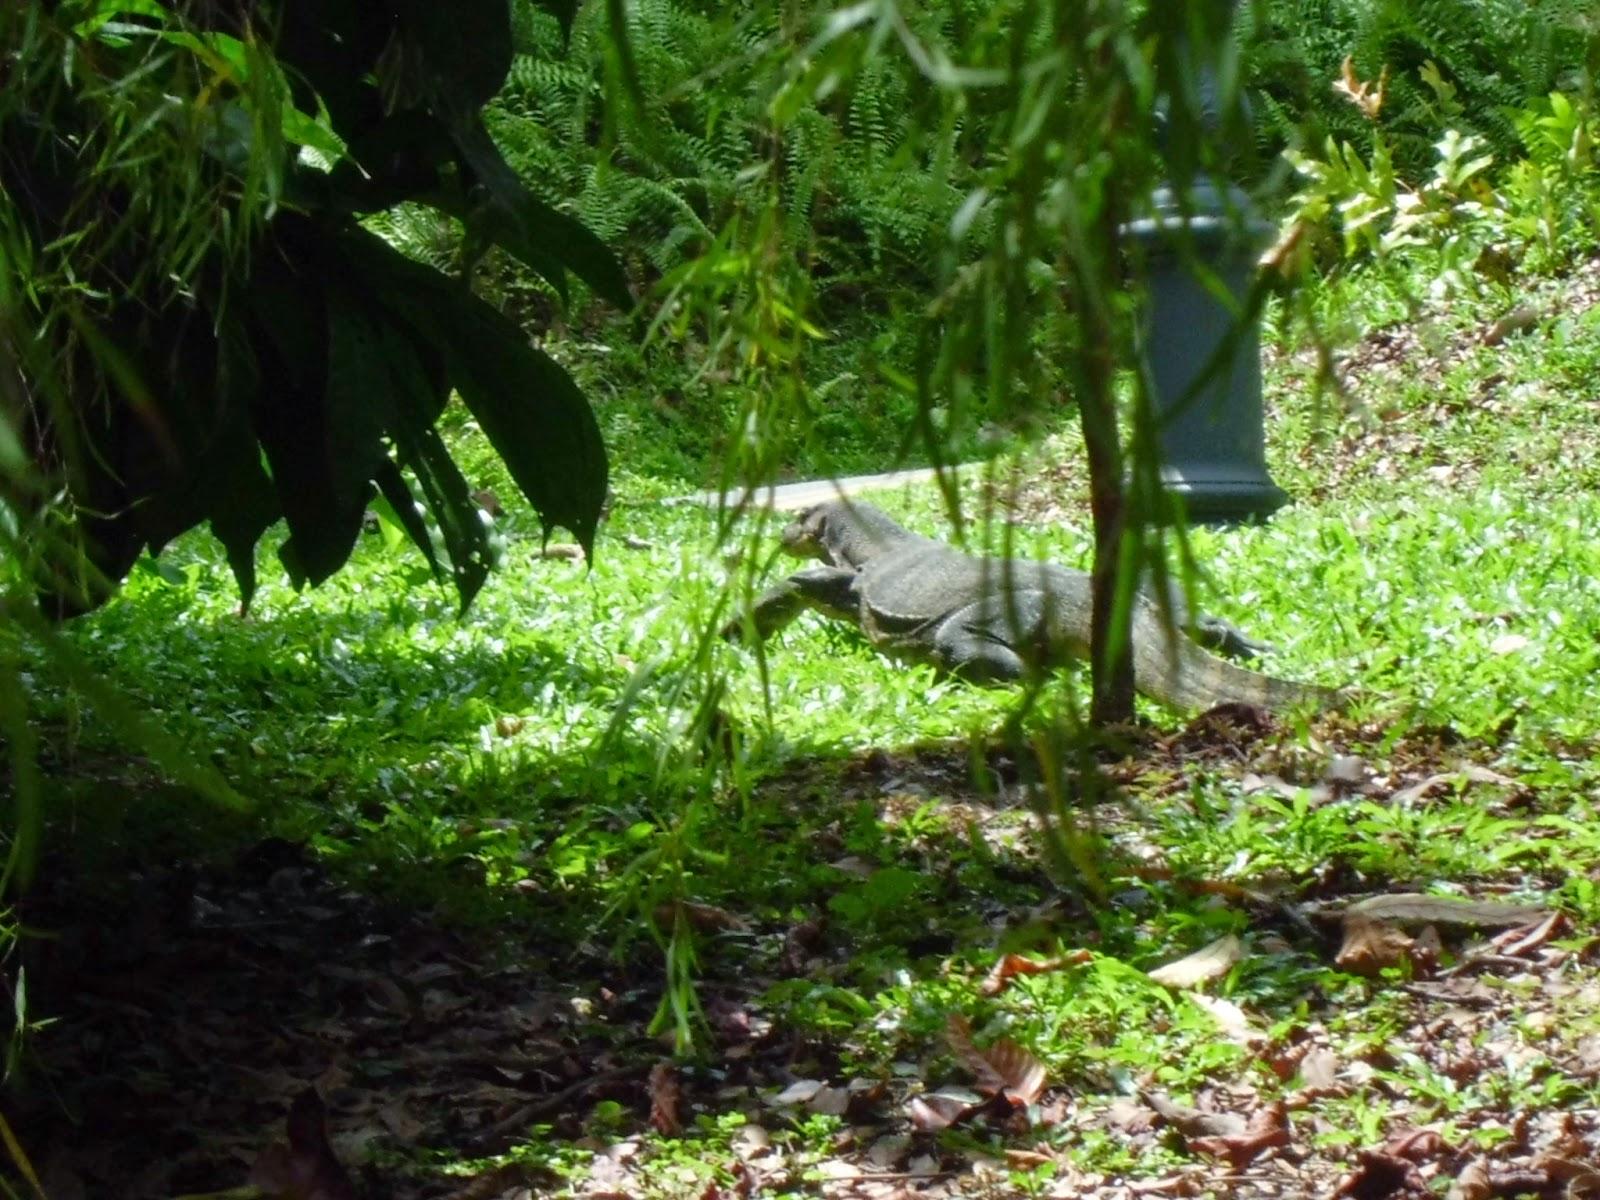 Singapore Botanic Gardens - monitor lizard